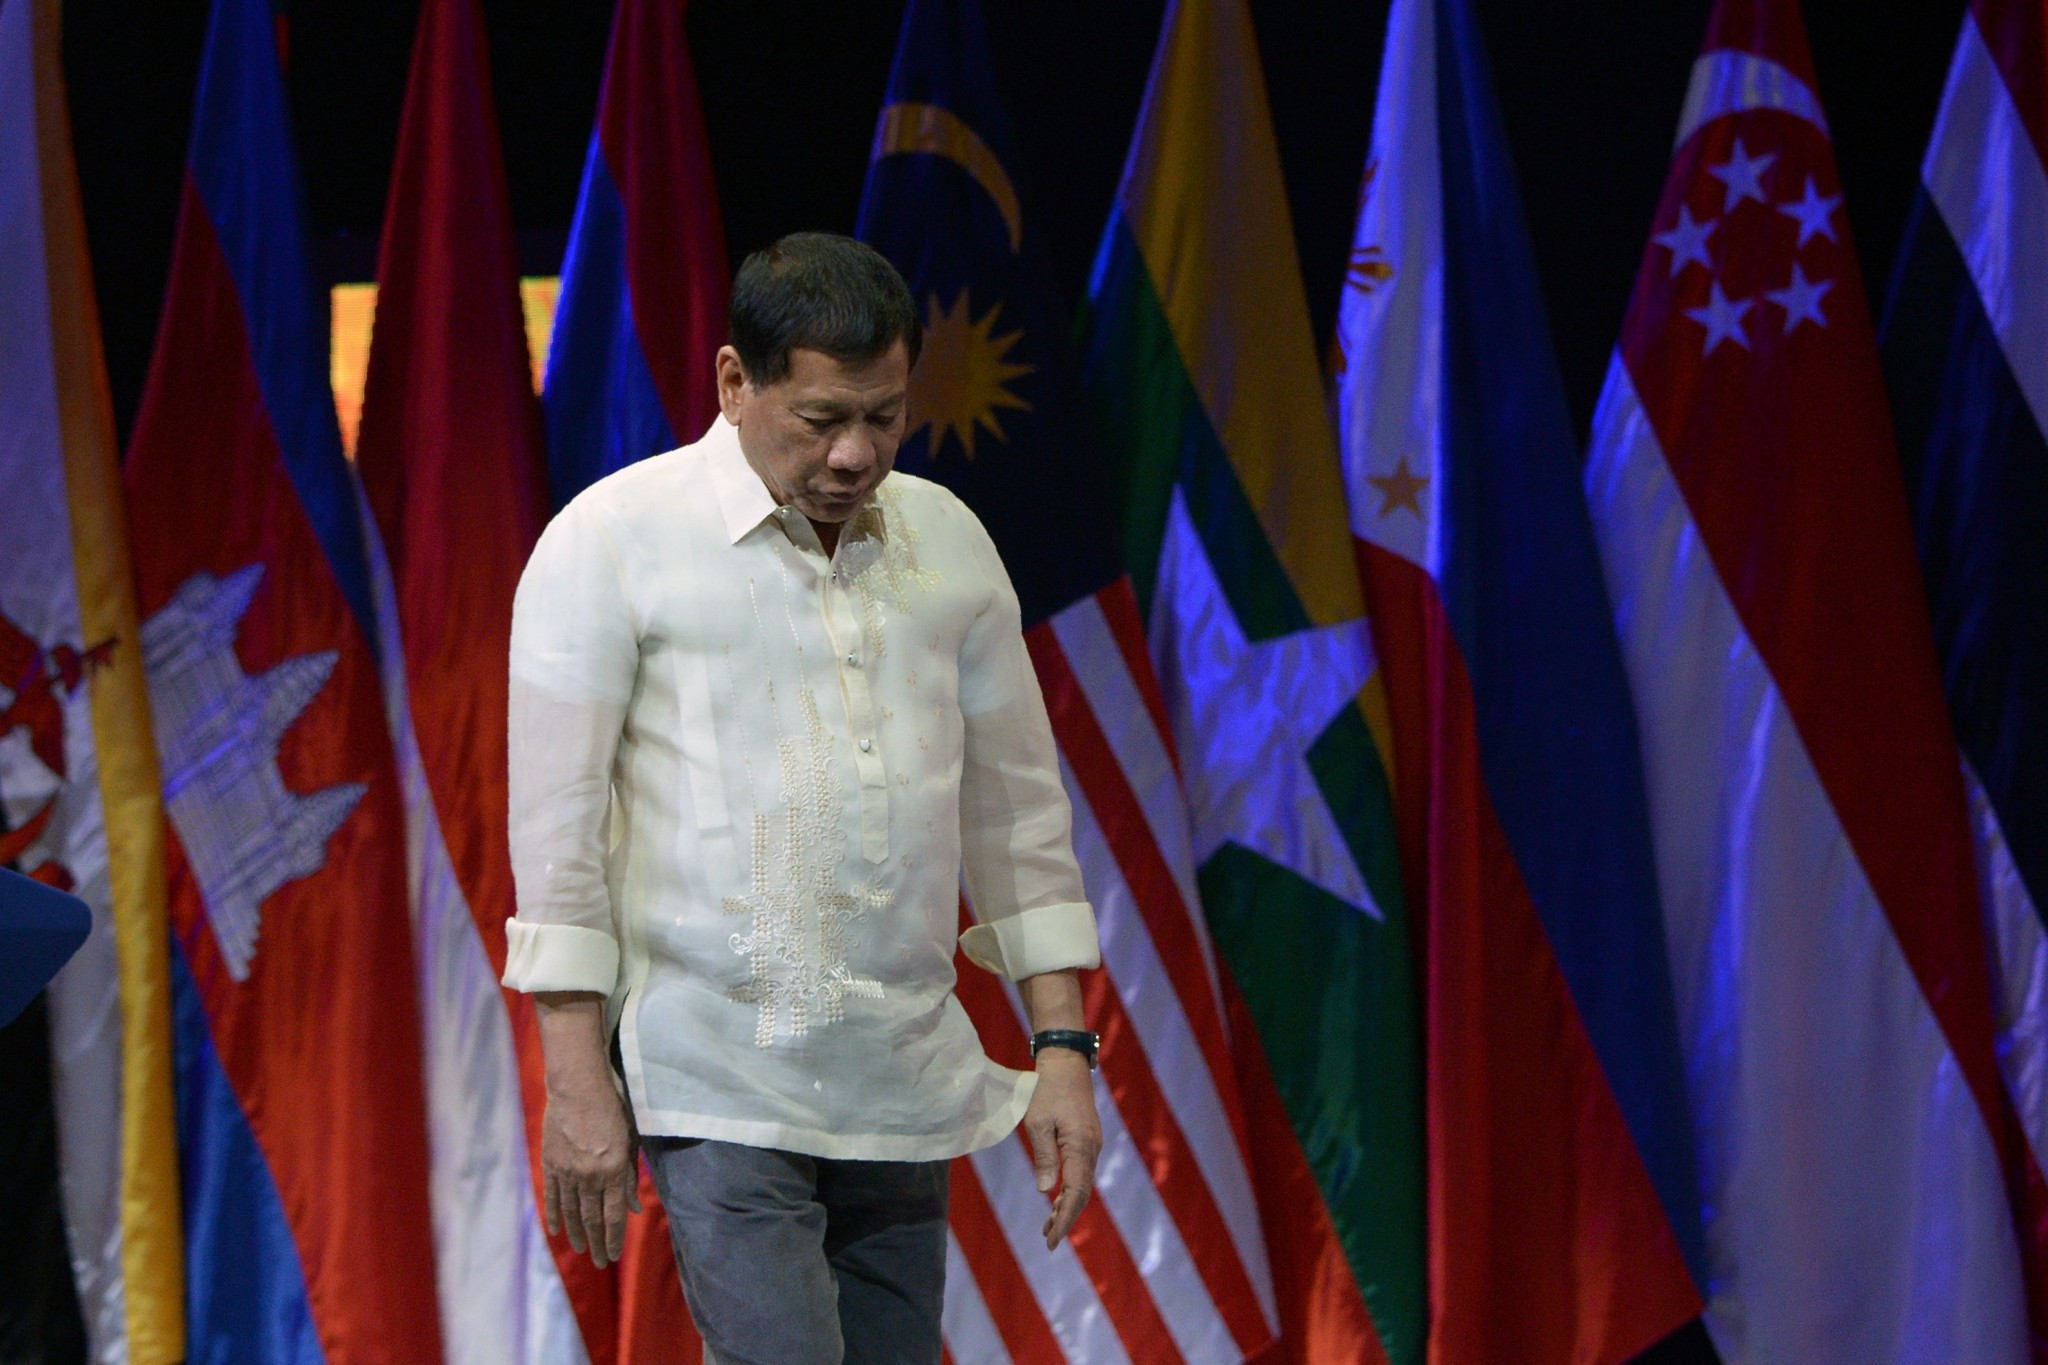 Philippines President Duterte confirms interest in hosting 2019 Southeast Asian Games